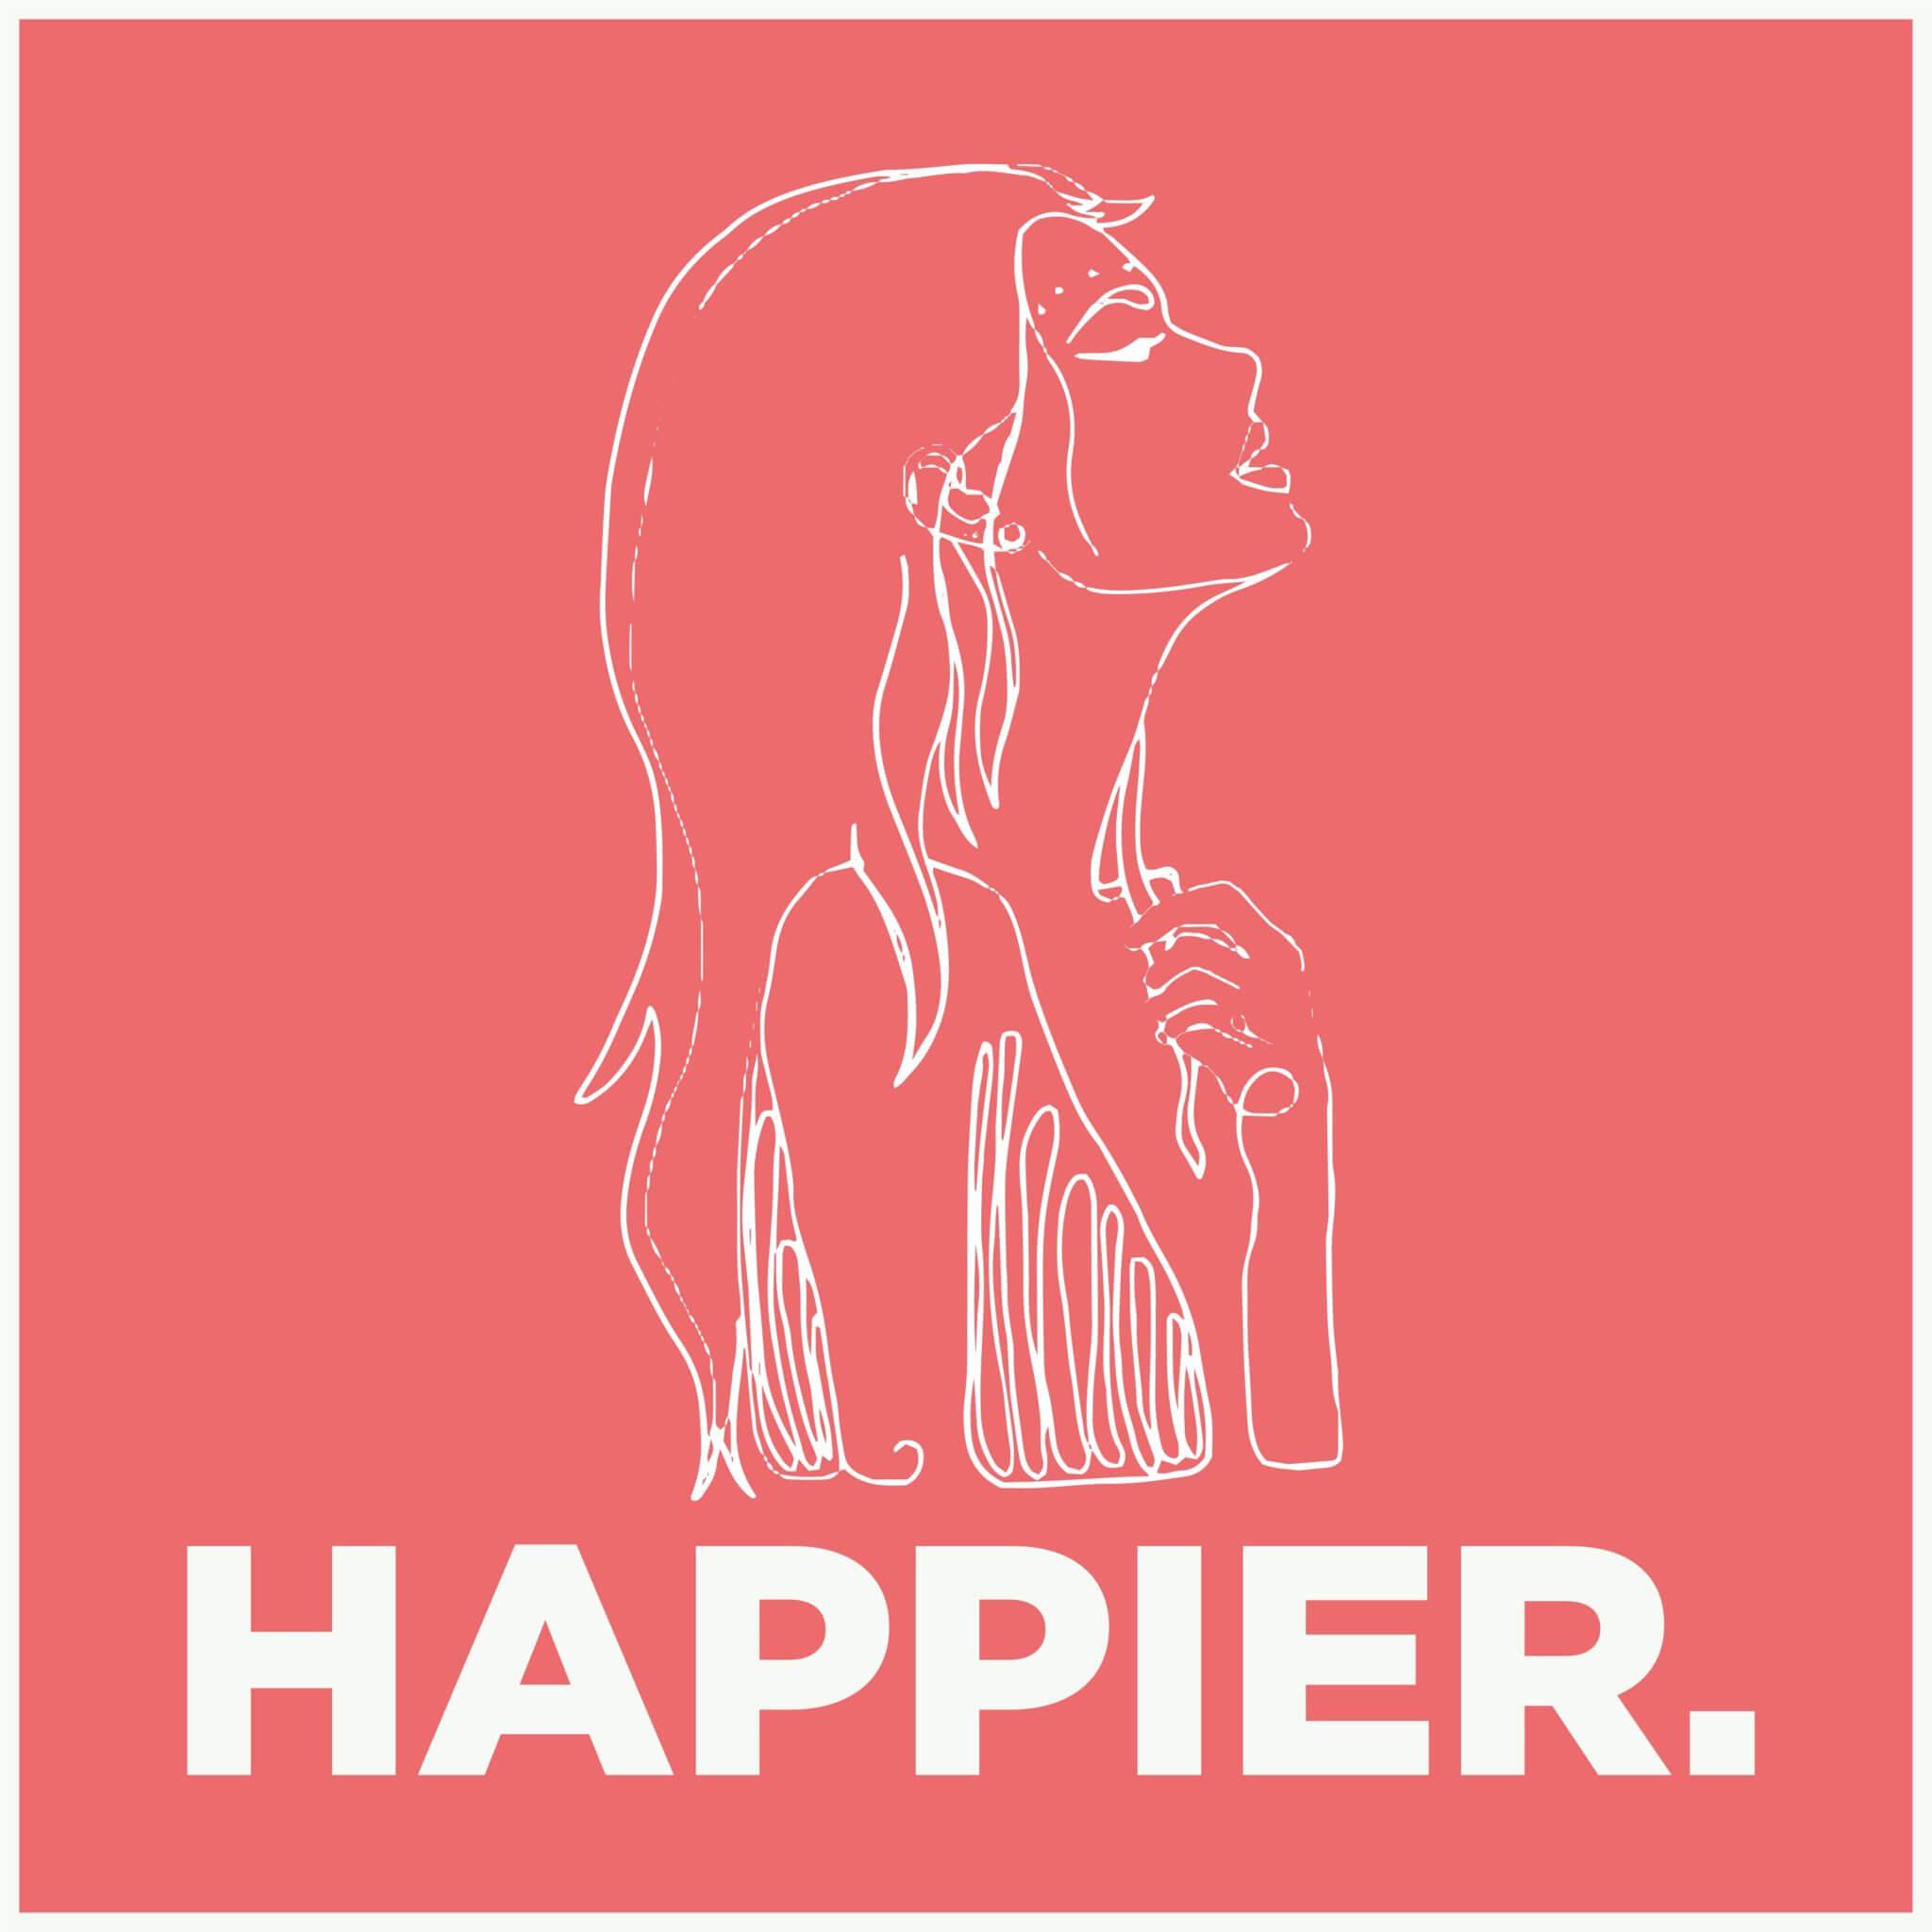 Happier-As-December-Falls